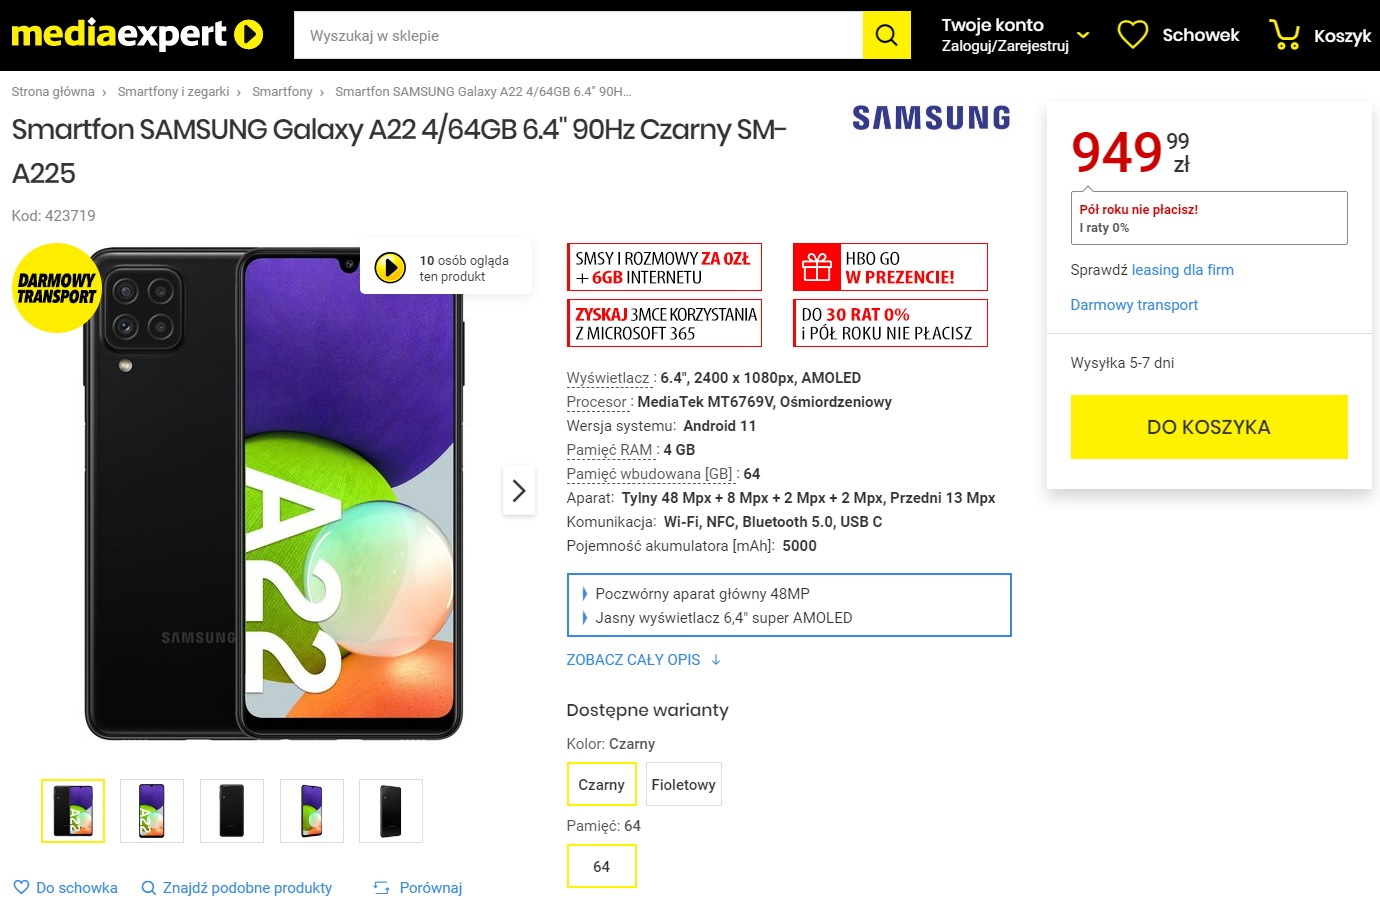 Samsung Galaxy A22 4G w sklepie Media Expert